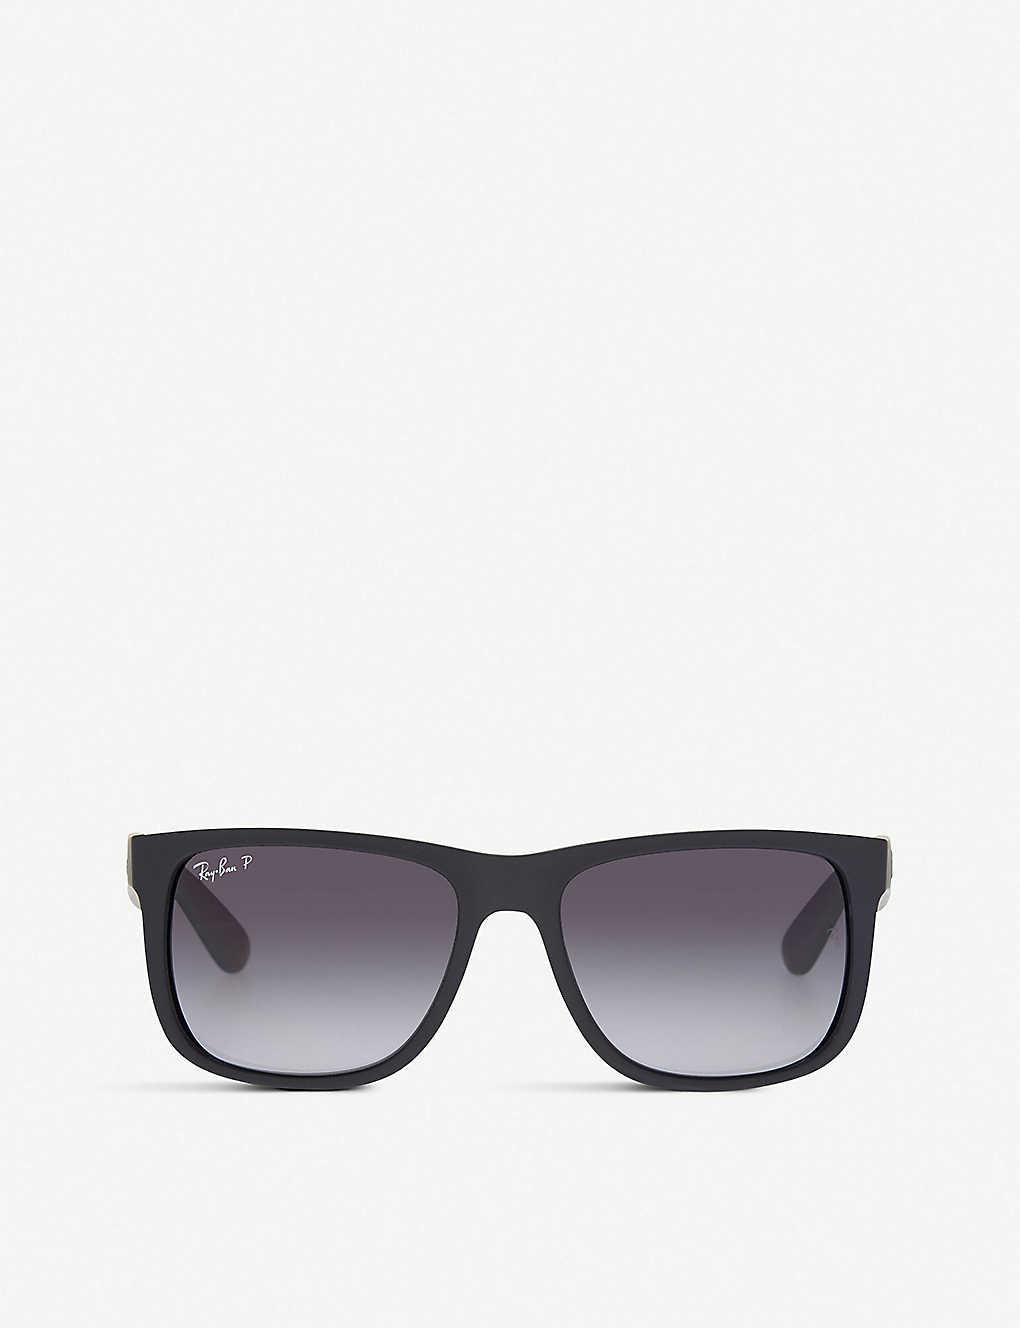 c36378a8a7 RAY-BAN - Square polarised sunglasses